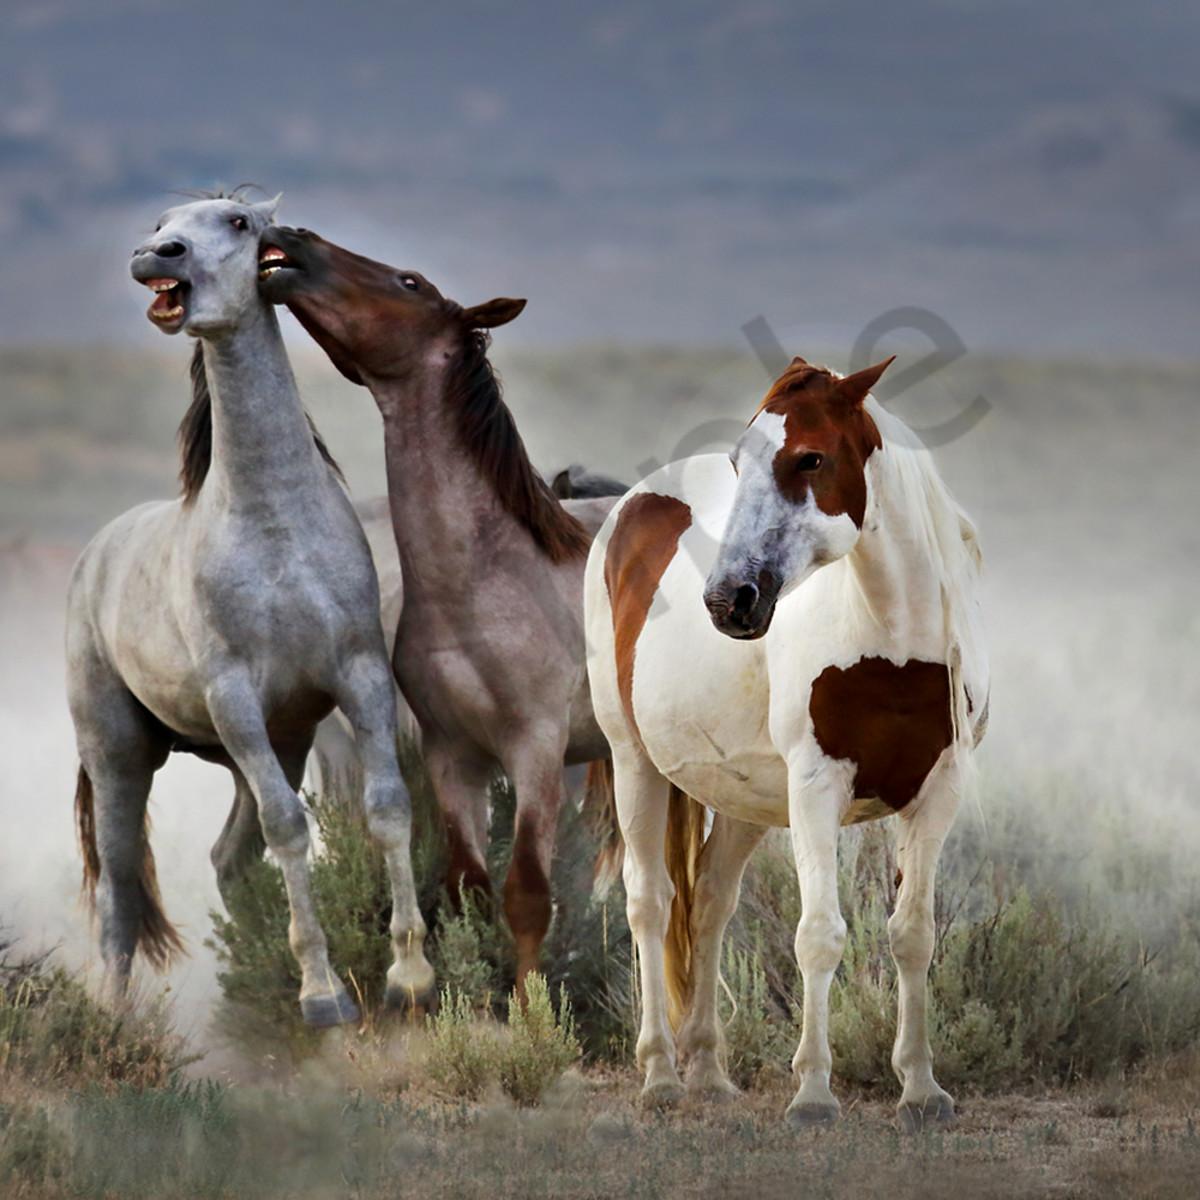 8033 jumping horses 6x4 web epjvb9